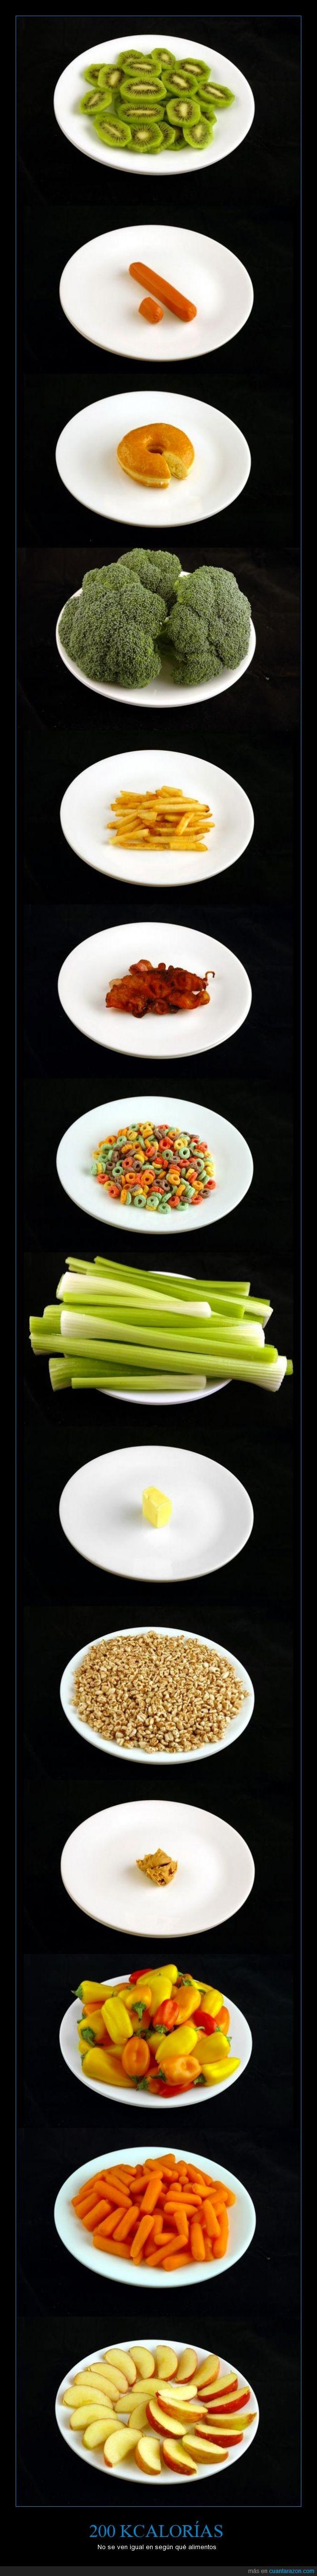 200,adelgazar,caloria,comer,comida,engordar,kcal,kilocaloria,mantequilla de cacahuete,manzana,salud,salud fácil,sano,zanahoria